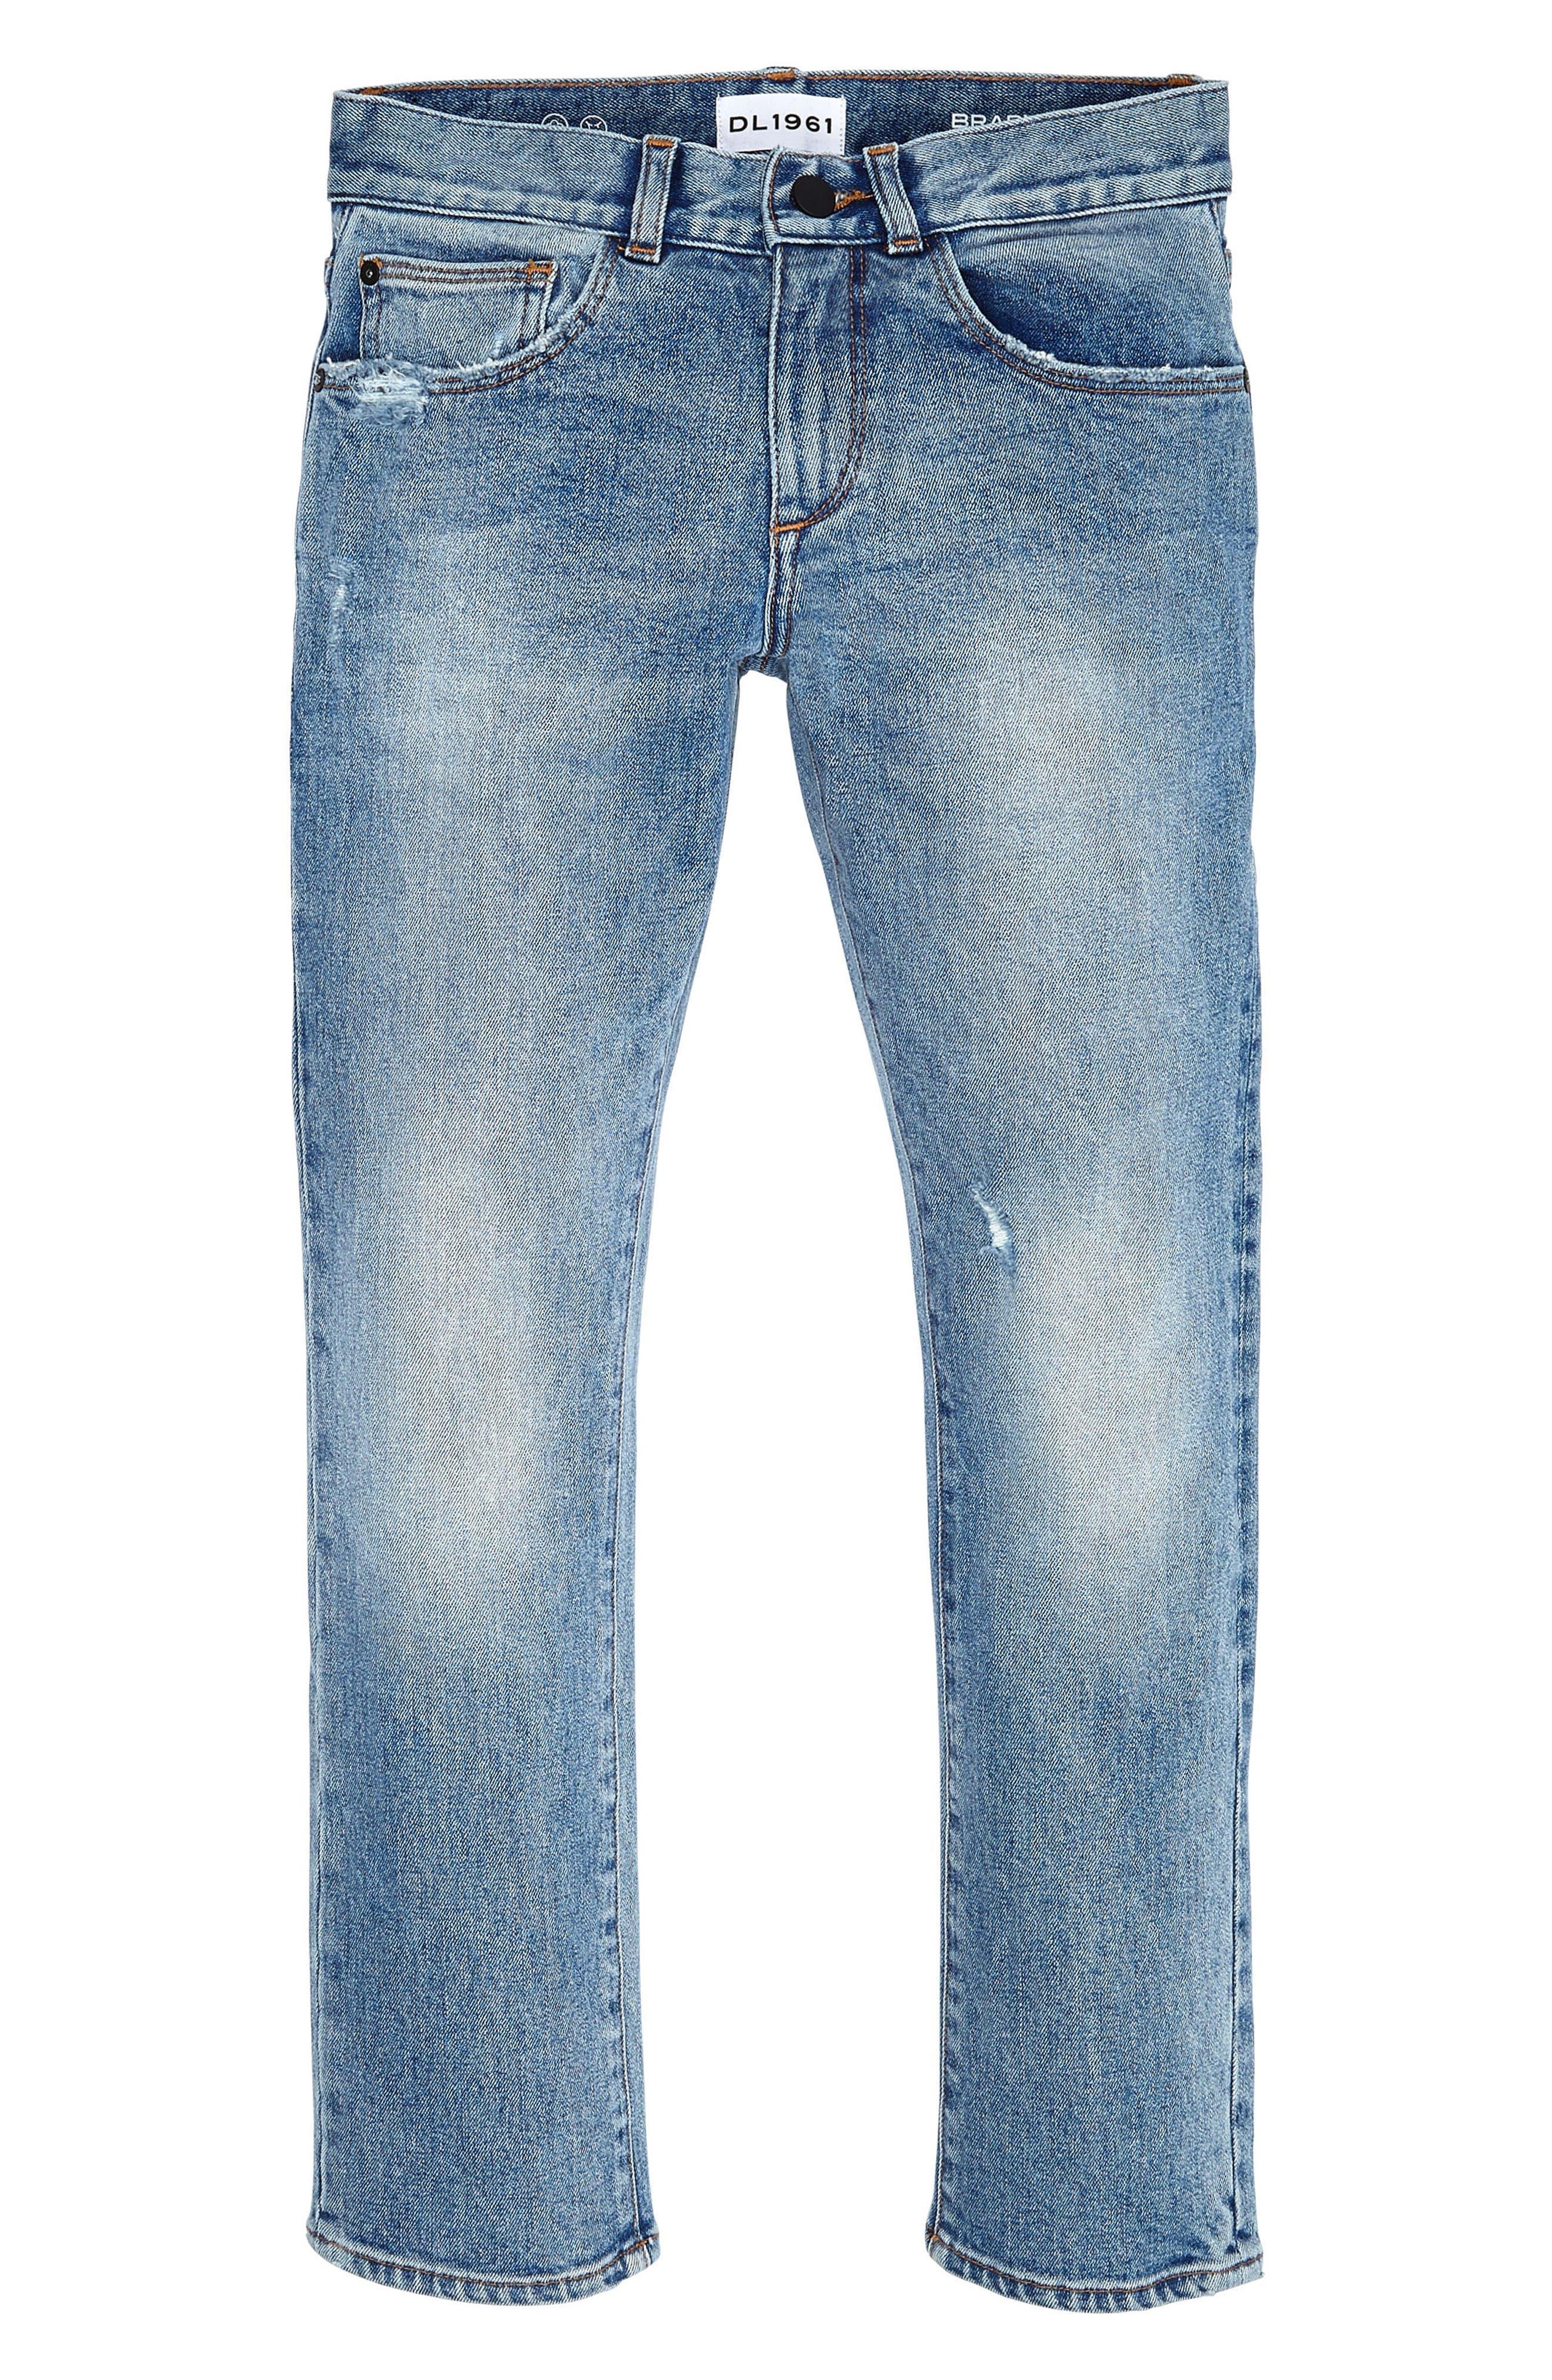 Brady Slim Fit Jeans,                         Main,                         color, Breathe